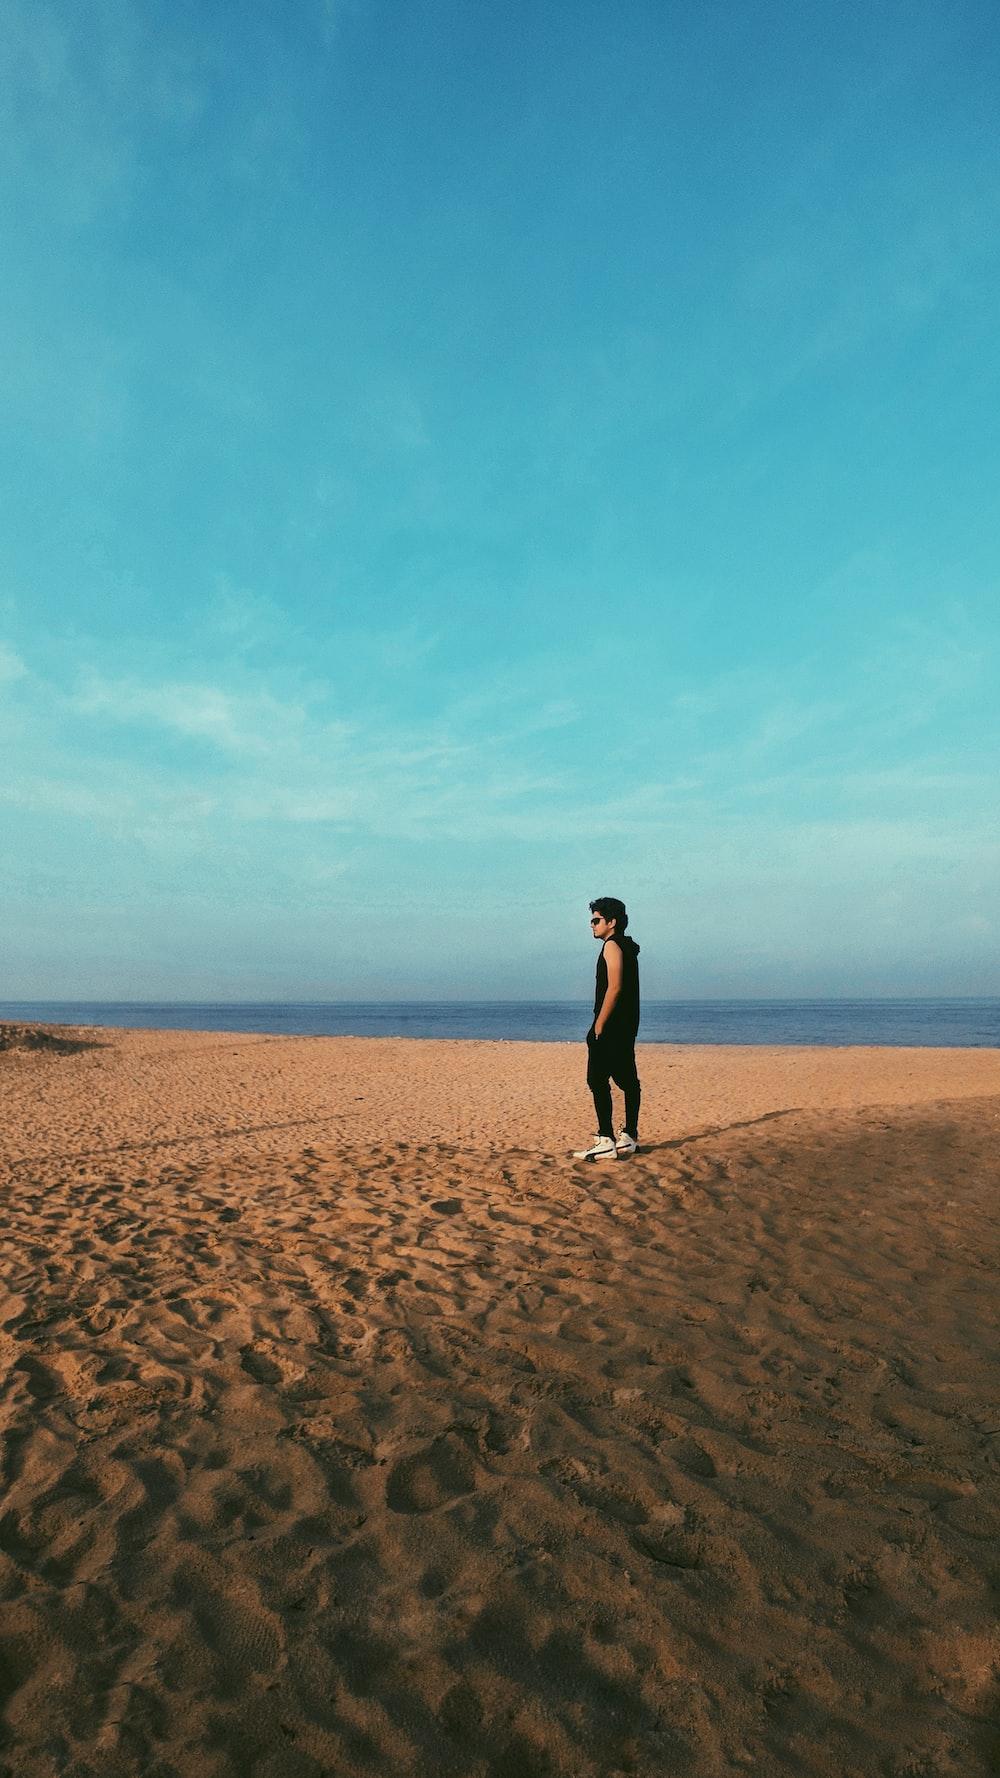 man standing on sand